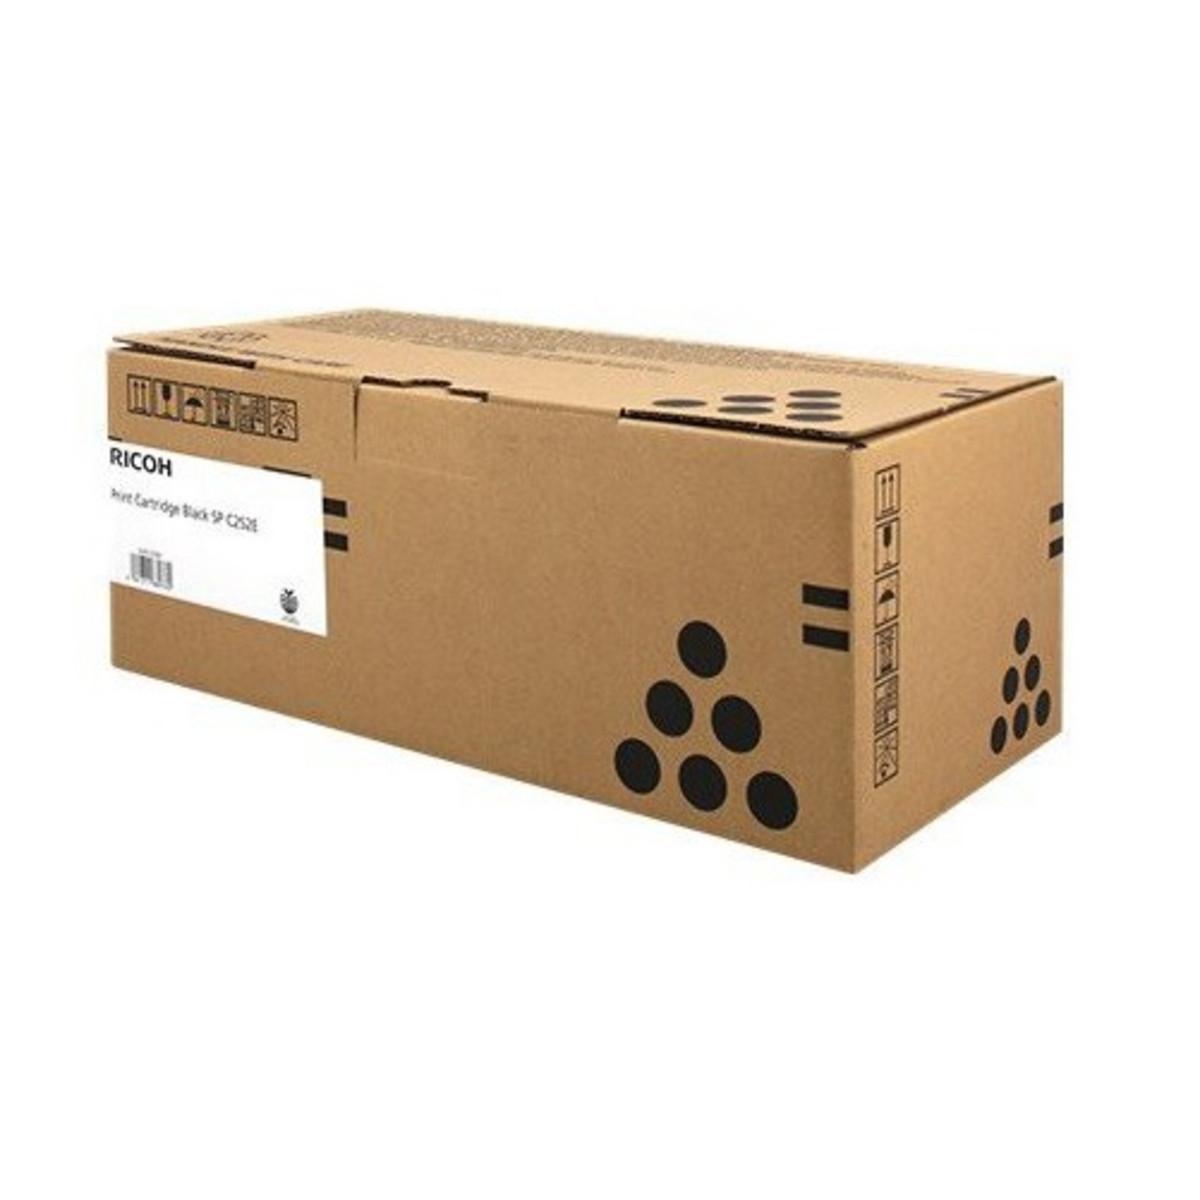 Ricoh 407720 Black Toner Cartridge